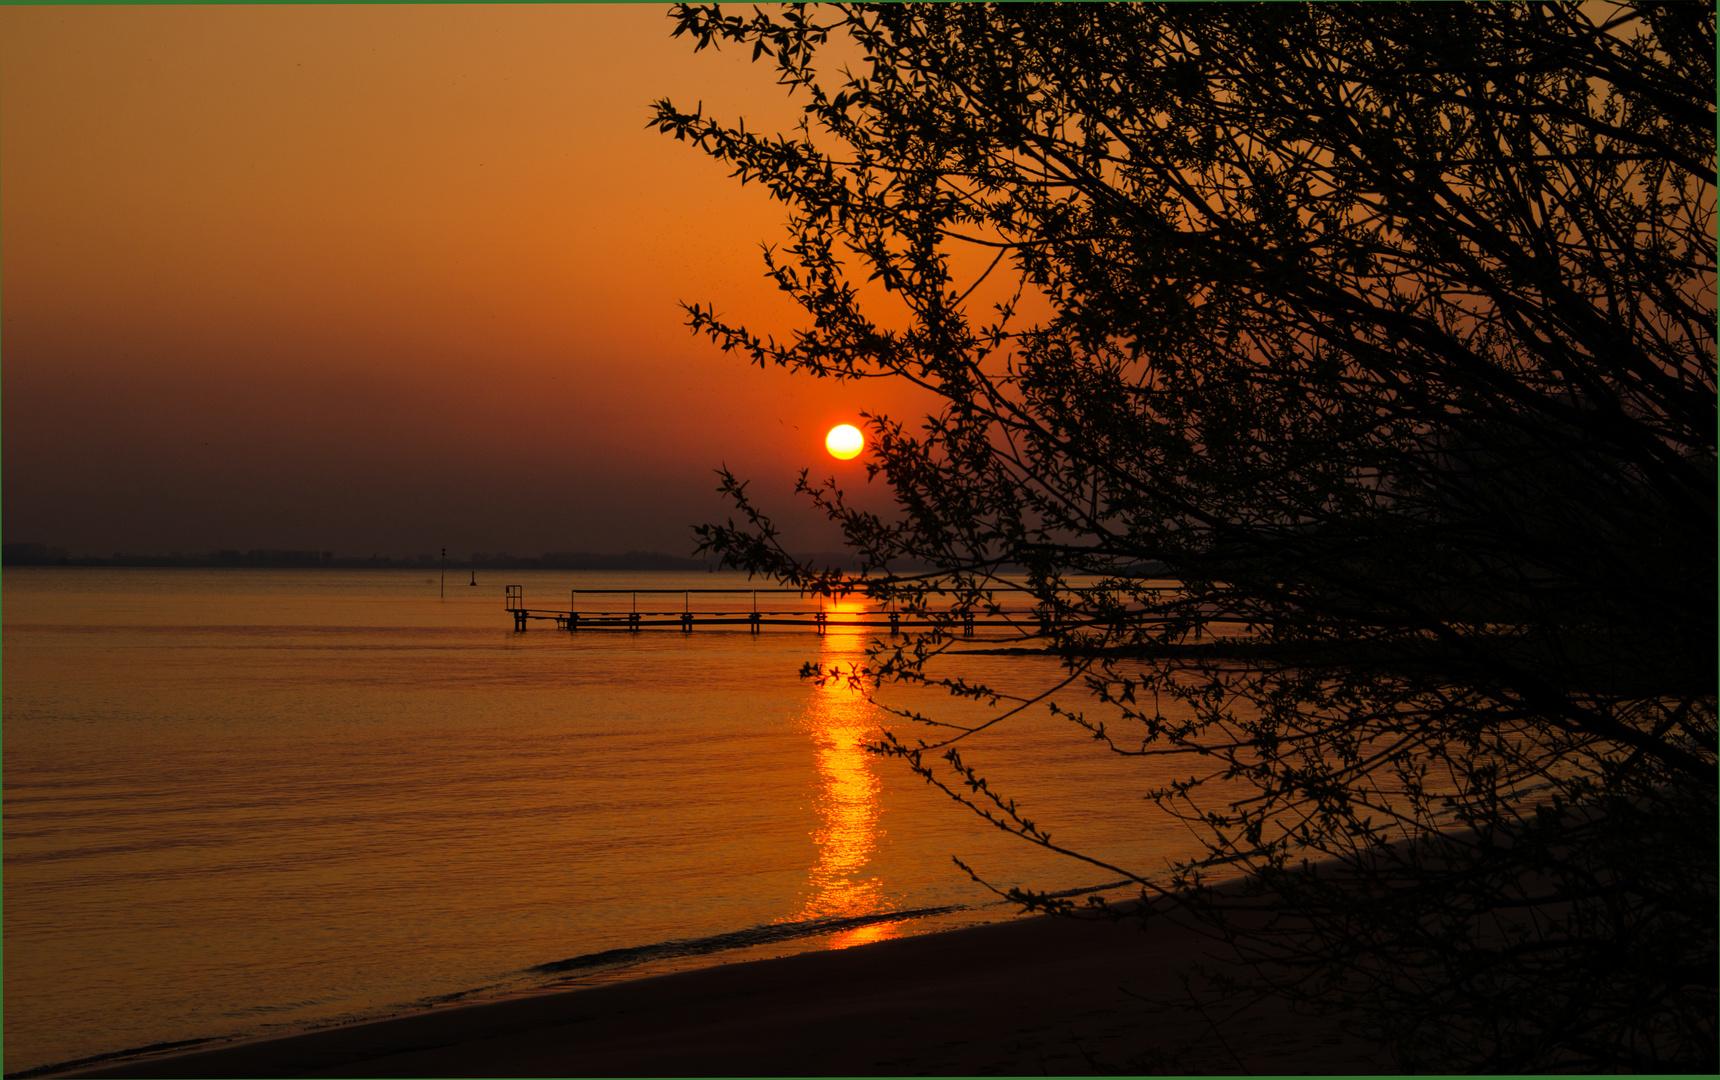 Sonnenuntergang in Kollmar am Hafen